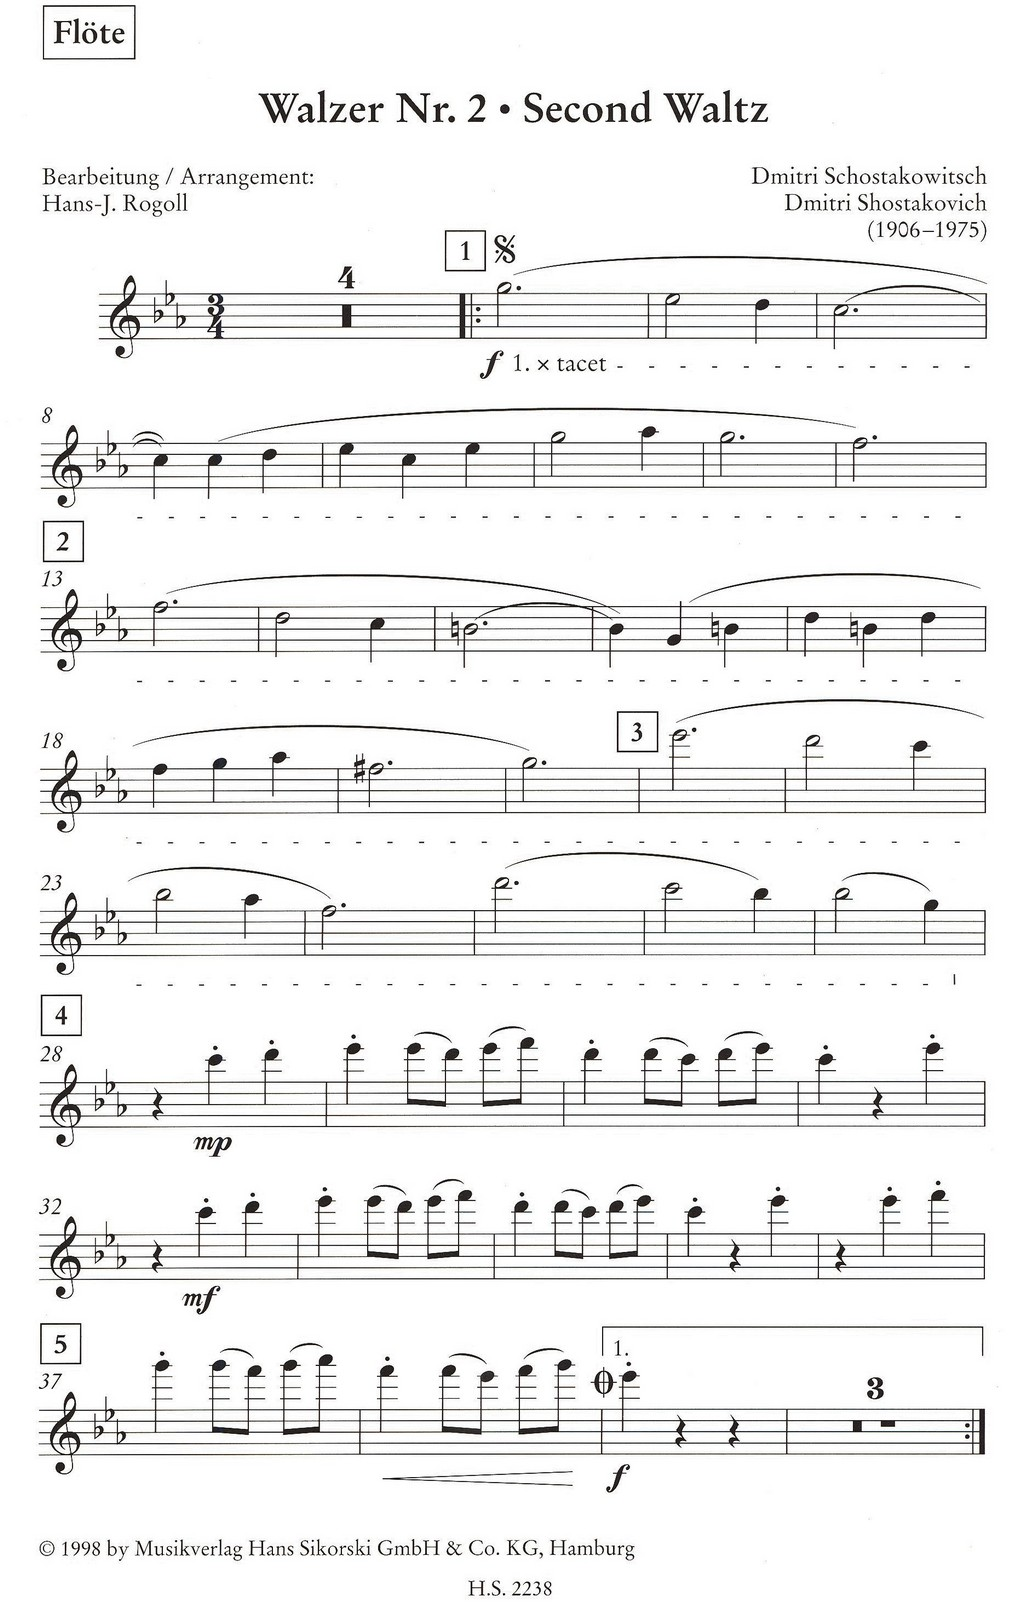 second-waltz-from-jazz-suite-no-2-by-dmitri-shosta eNoty eu